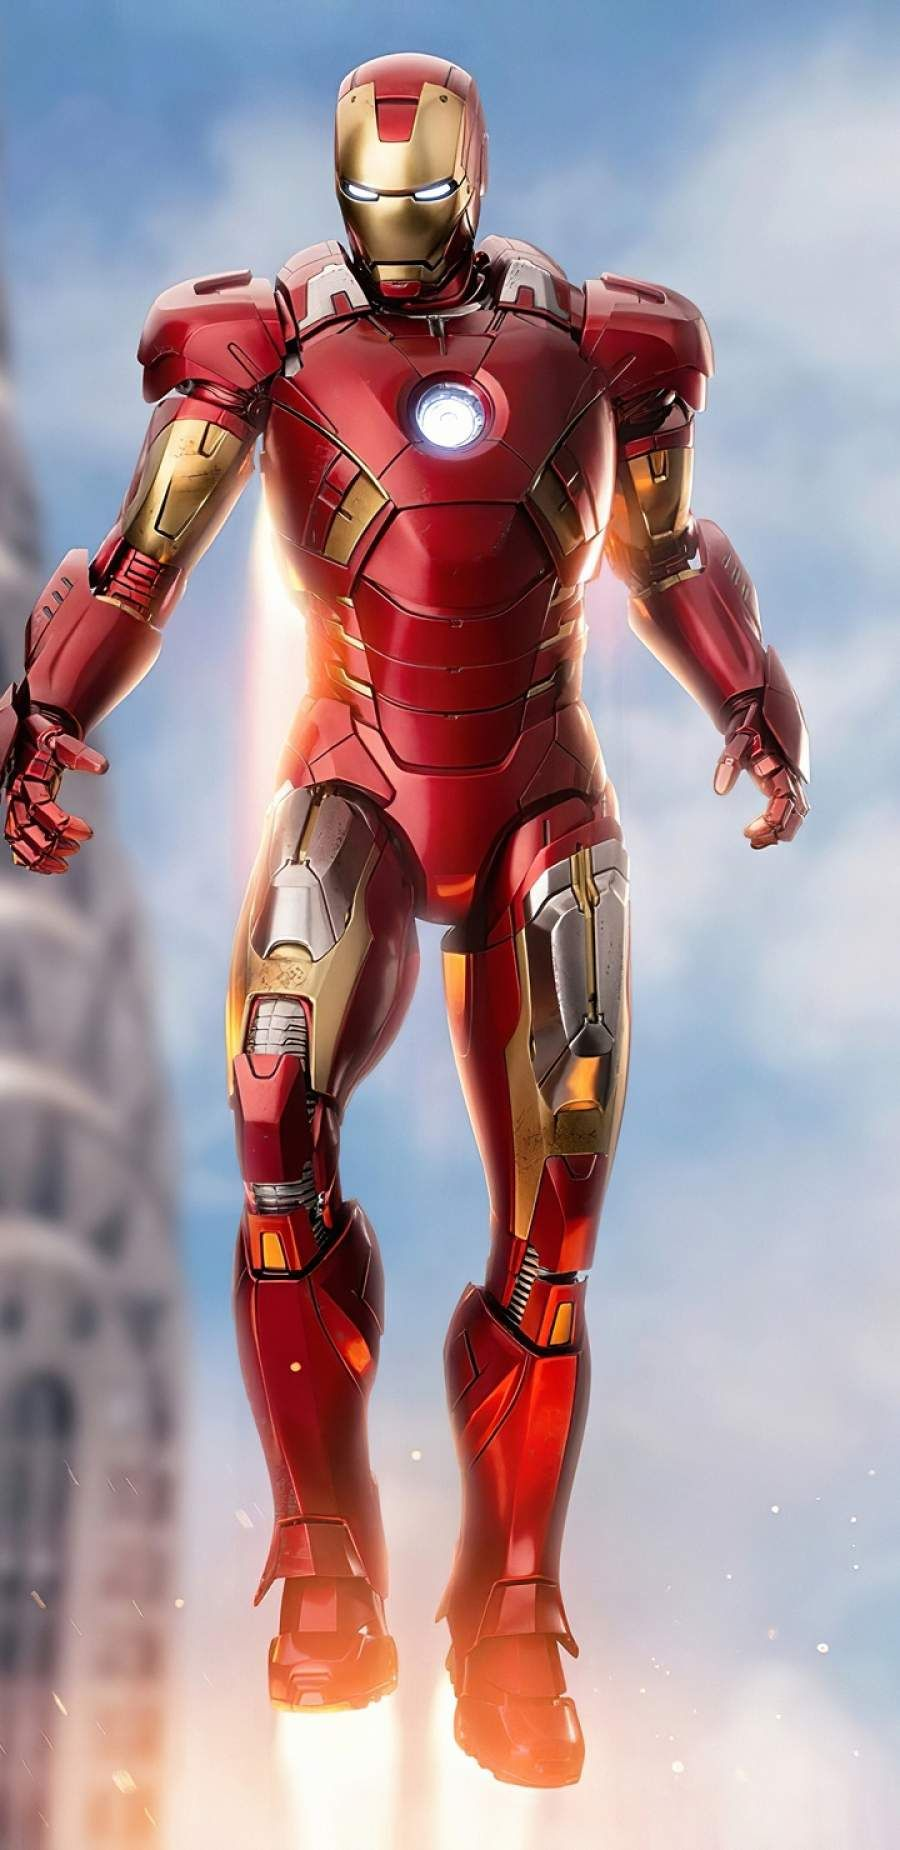 Iron man new iphone wallpaper in 2020 superhero